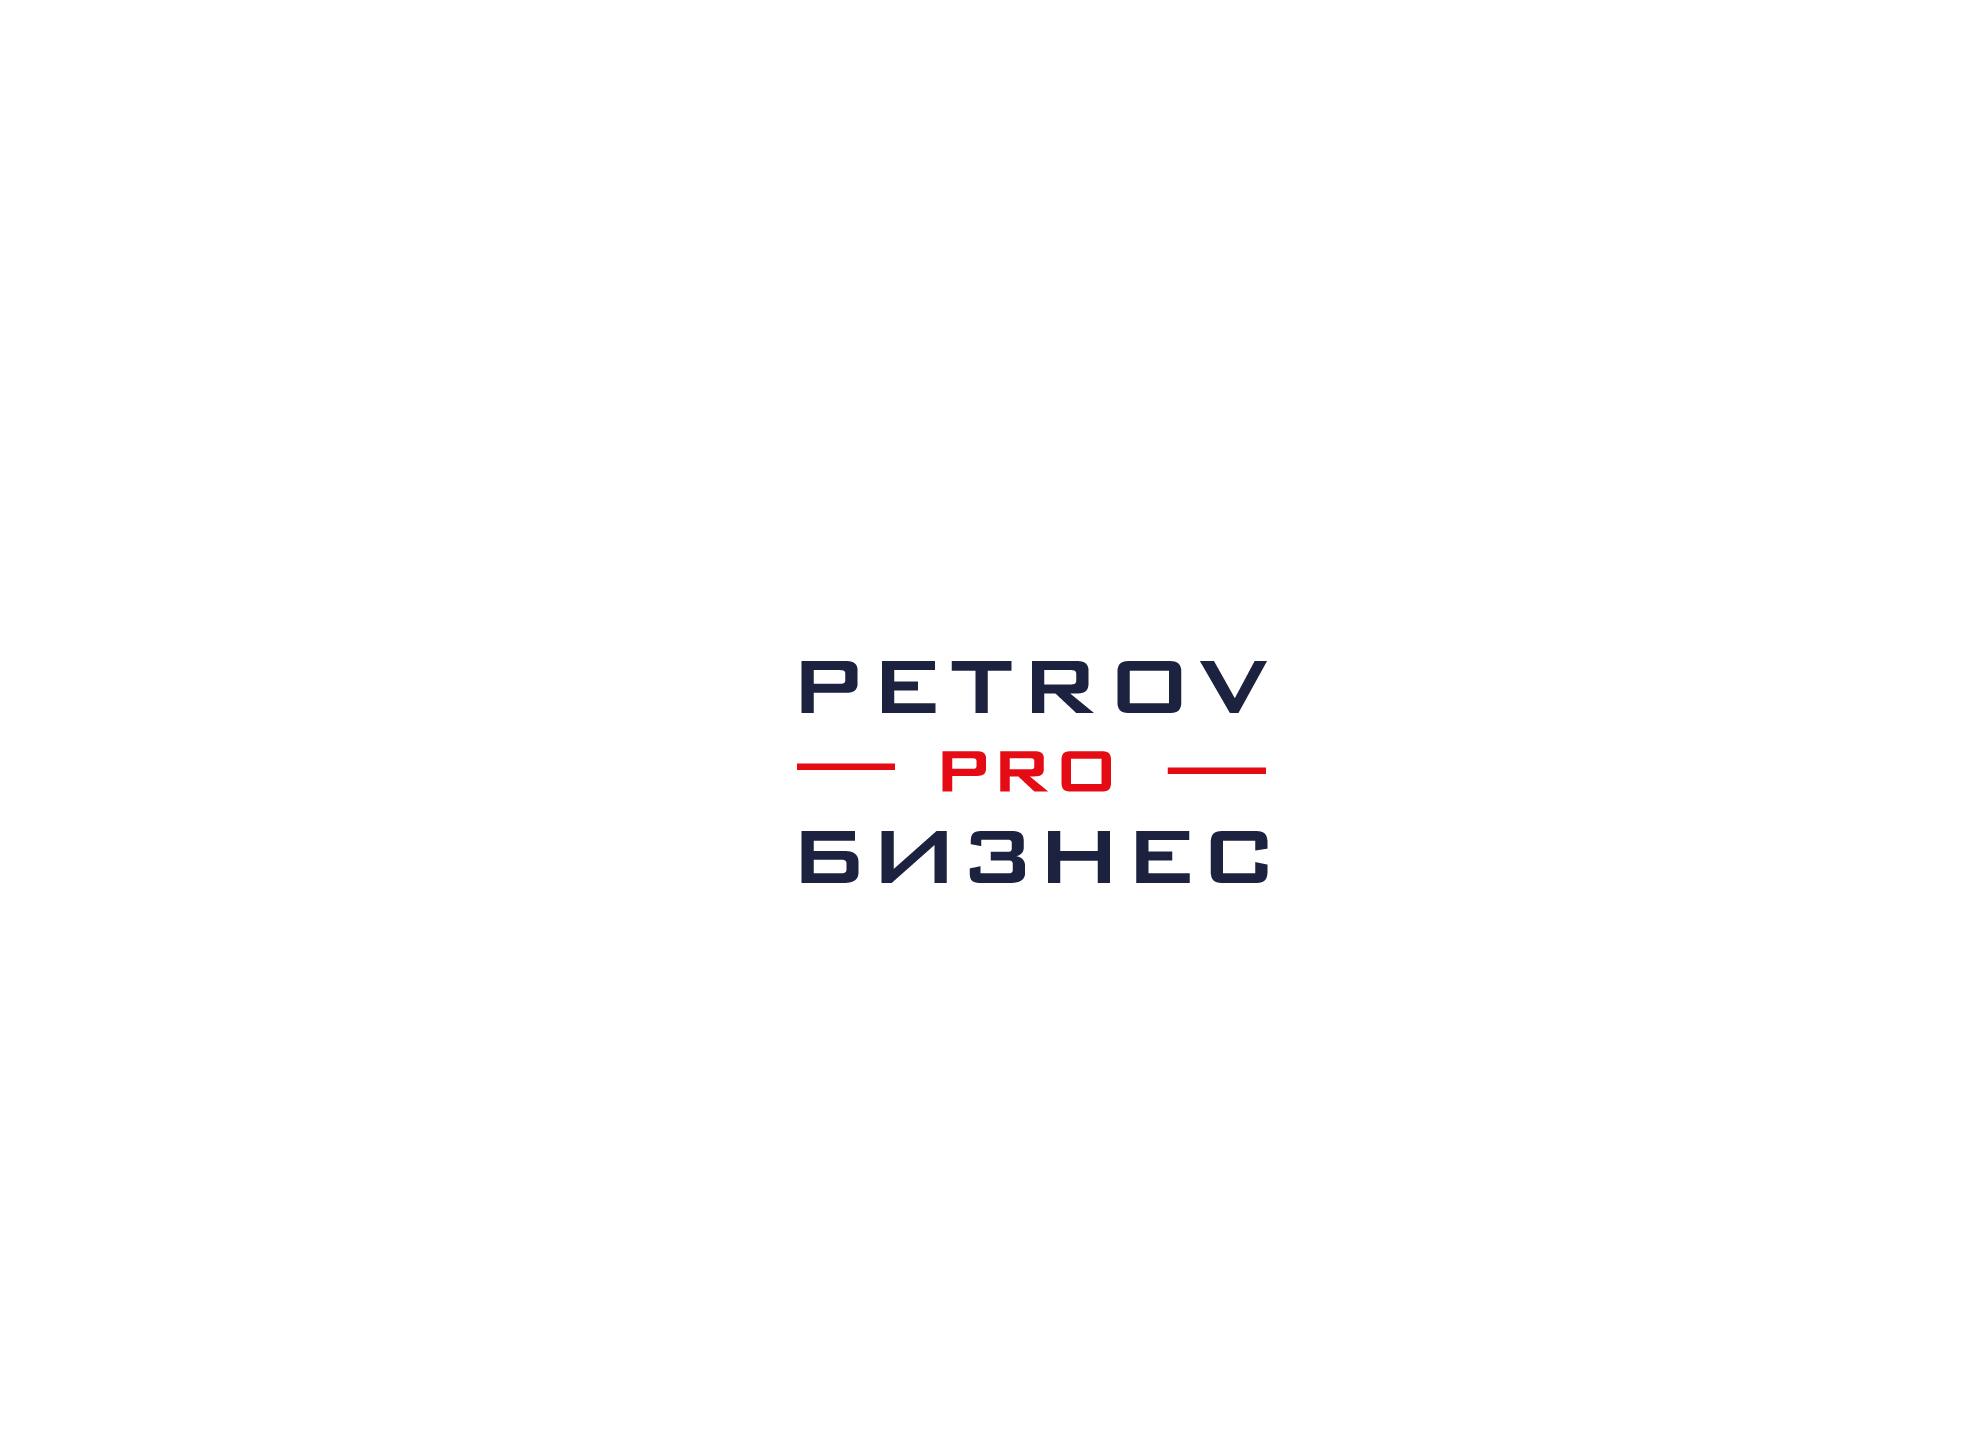 Создать логотип для YouTube канала  фото f_2515bfec55bc62a5.jpg